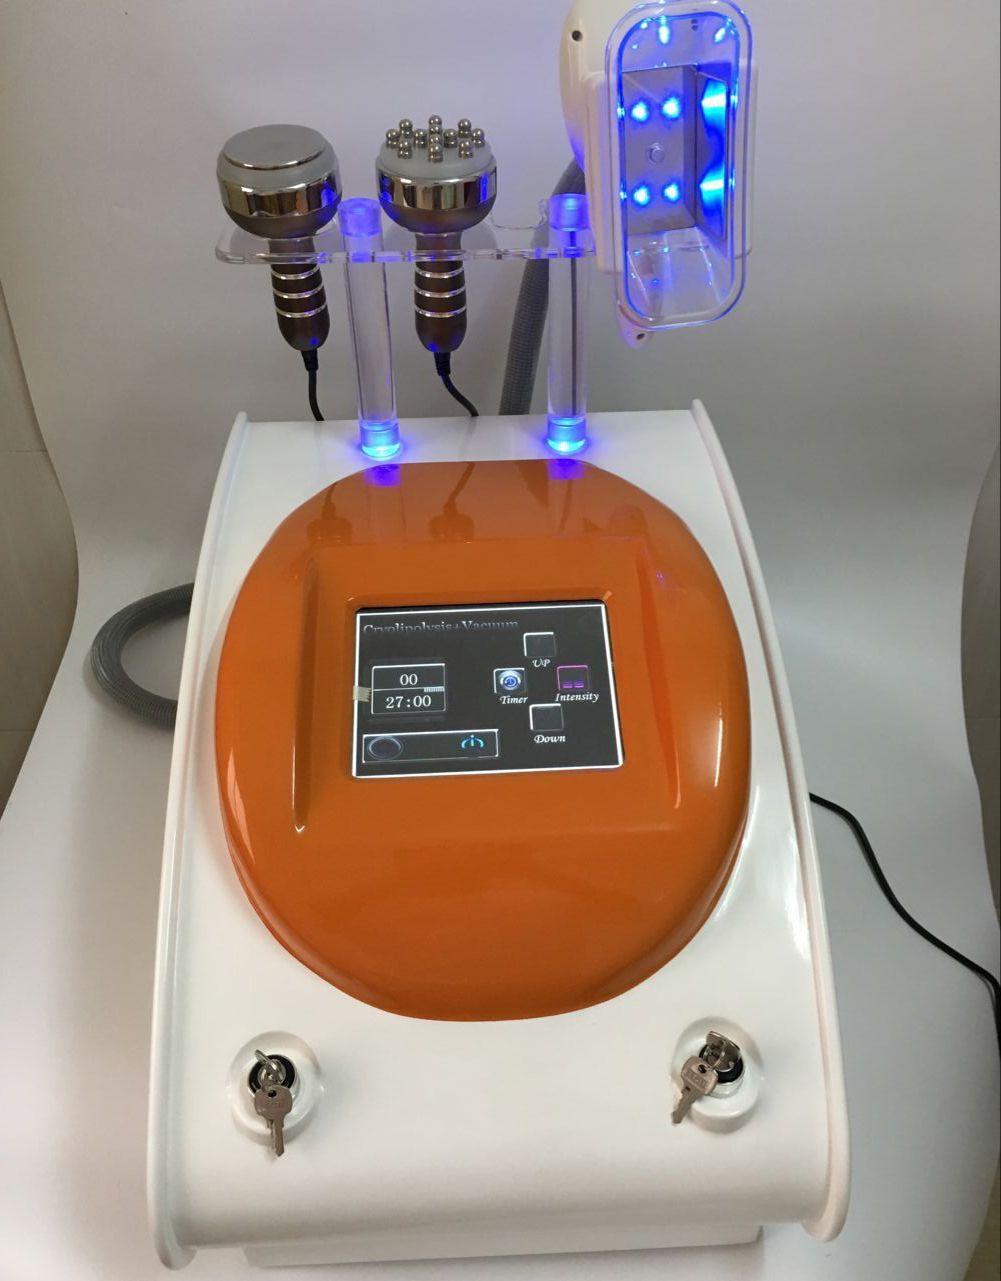 Machine de congélation de corps frais de haute qualité grosse machine de congélation perte de poids de cavitation machine